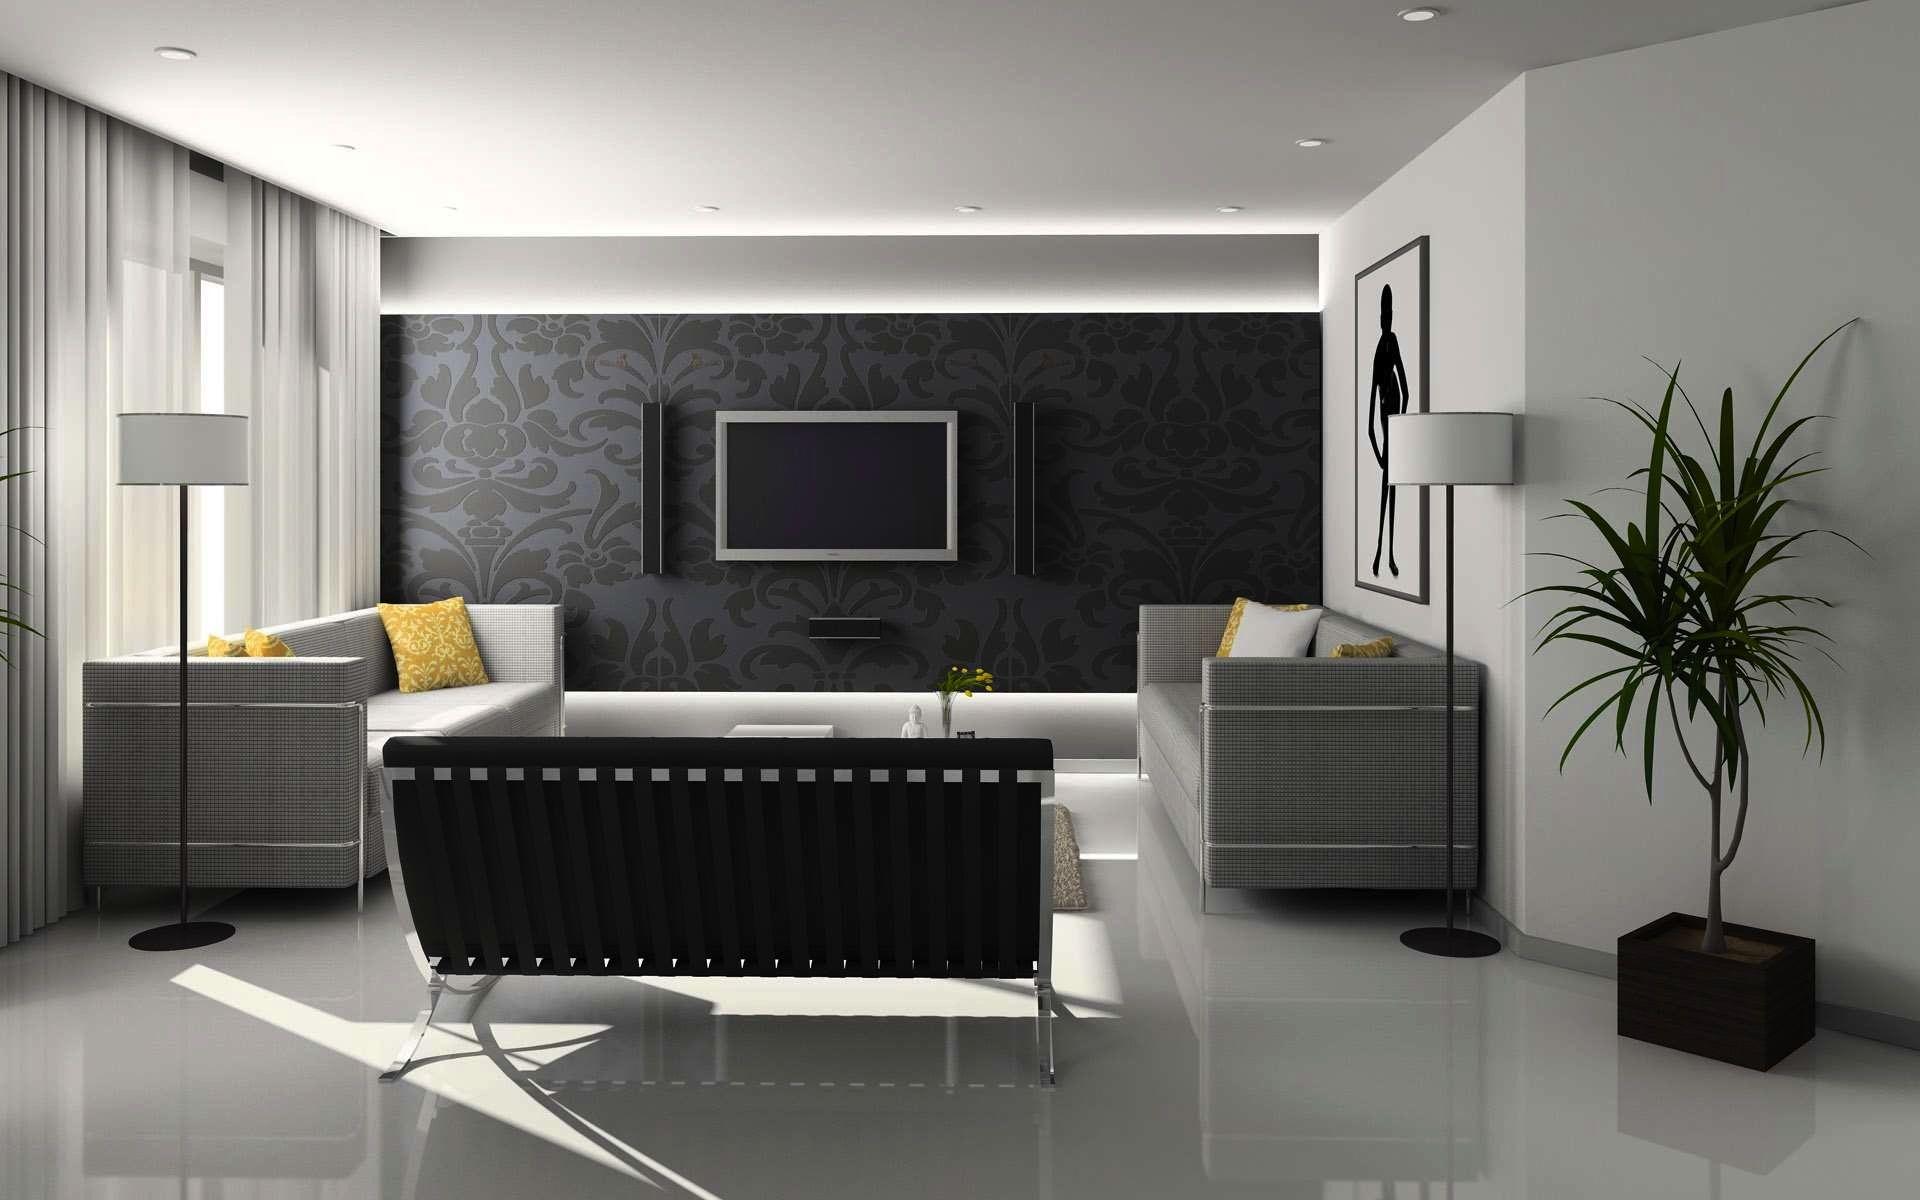 Luxury interior design outstanding d luxury interior design hd